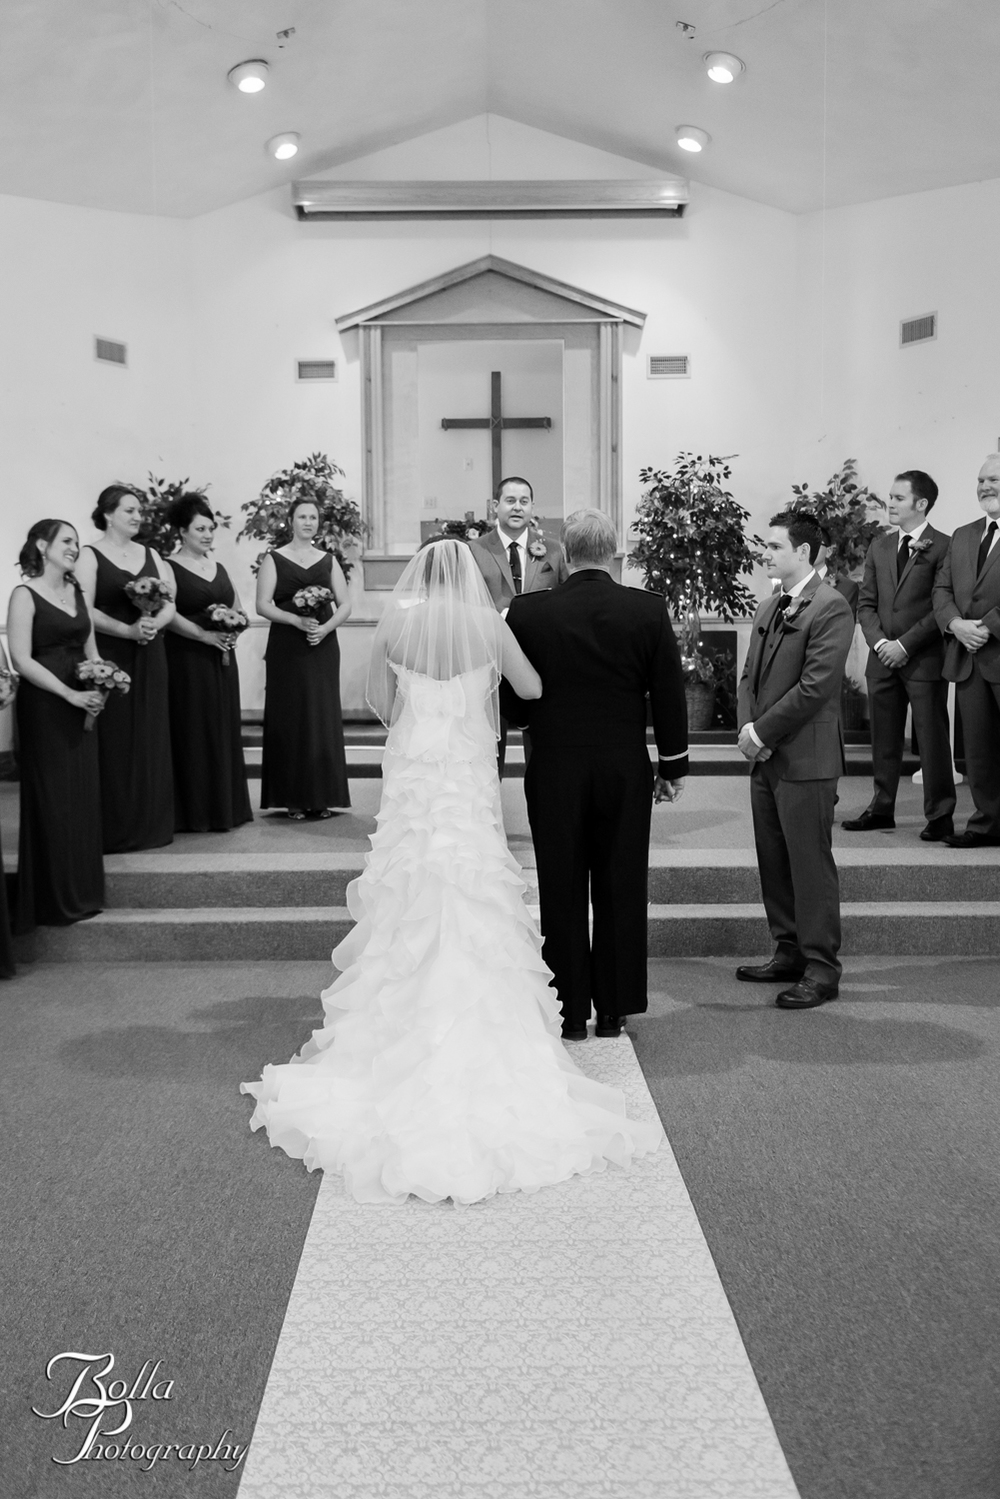 Bolla_Photography_St_Louis_wedding_photographer-0160.jpg